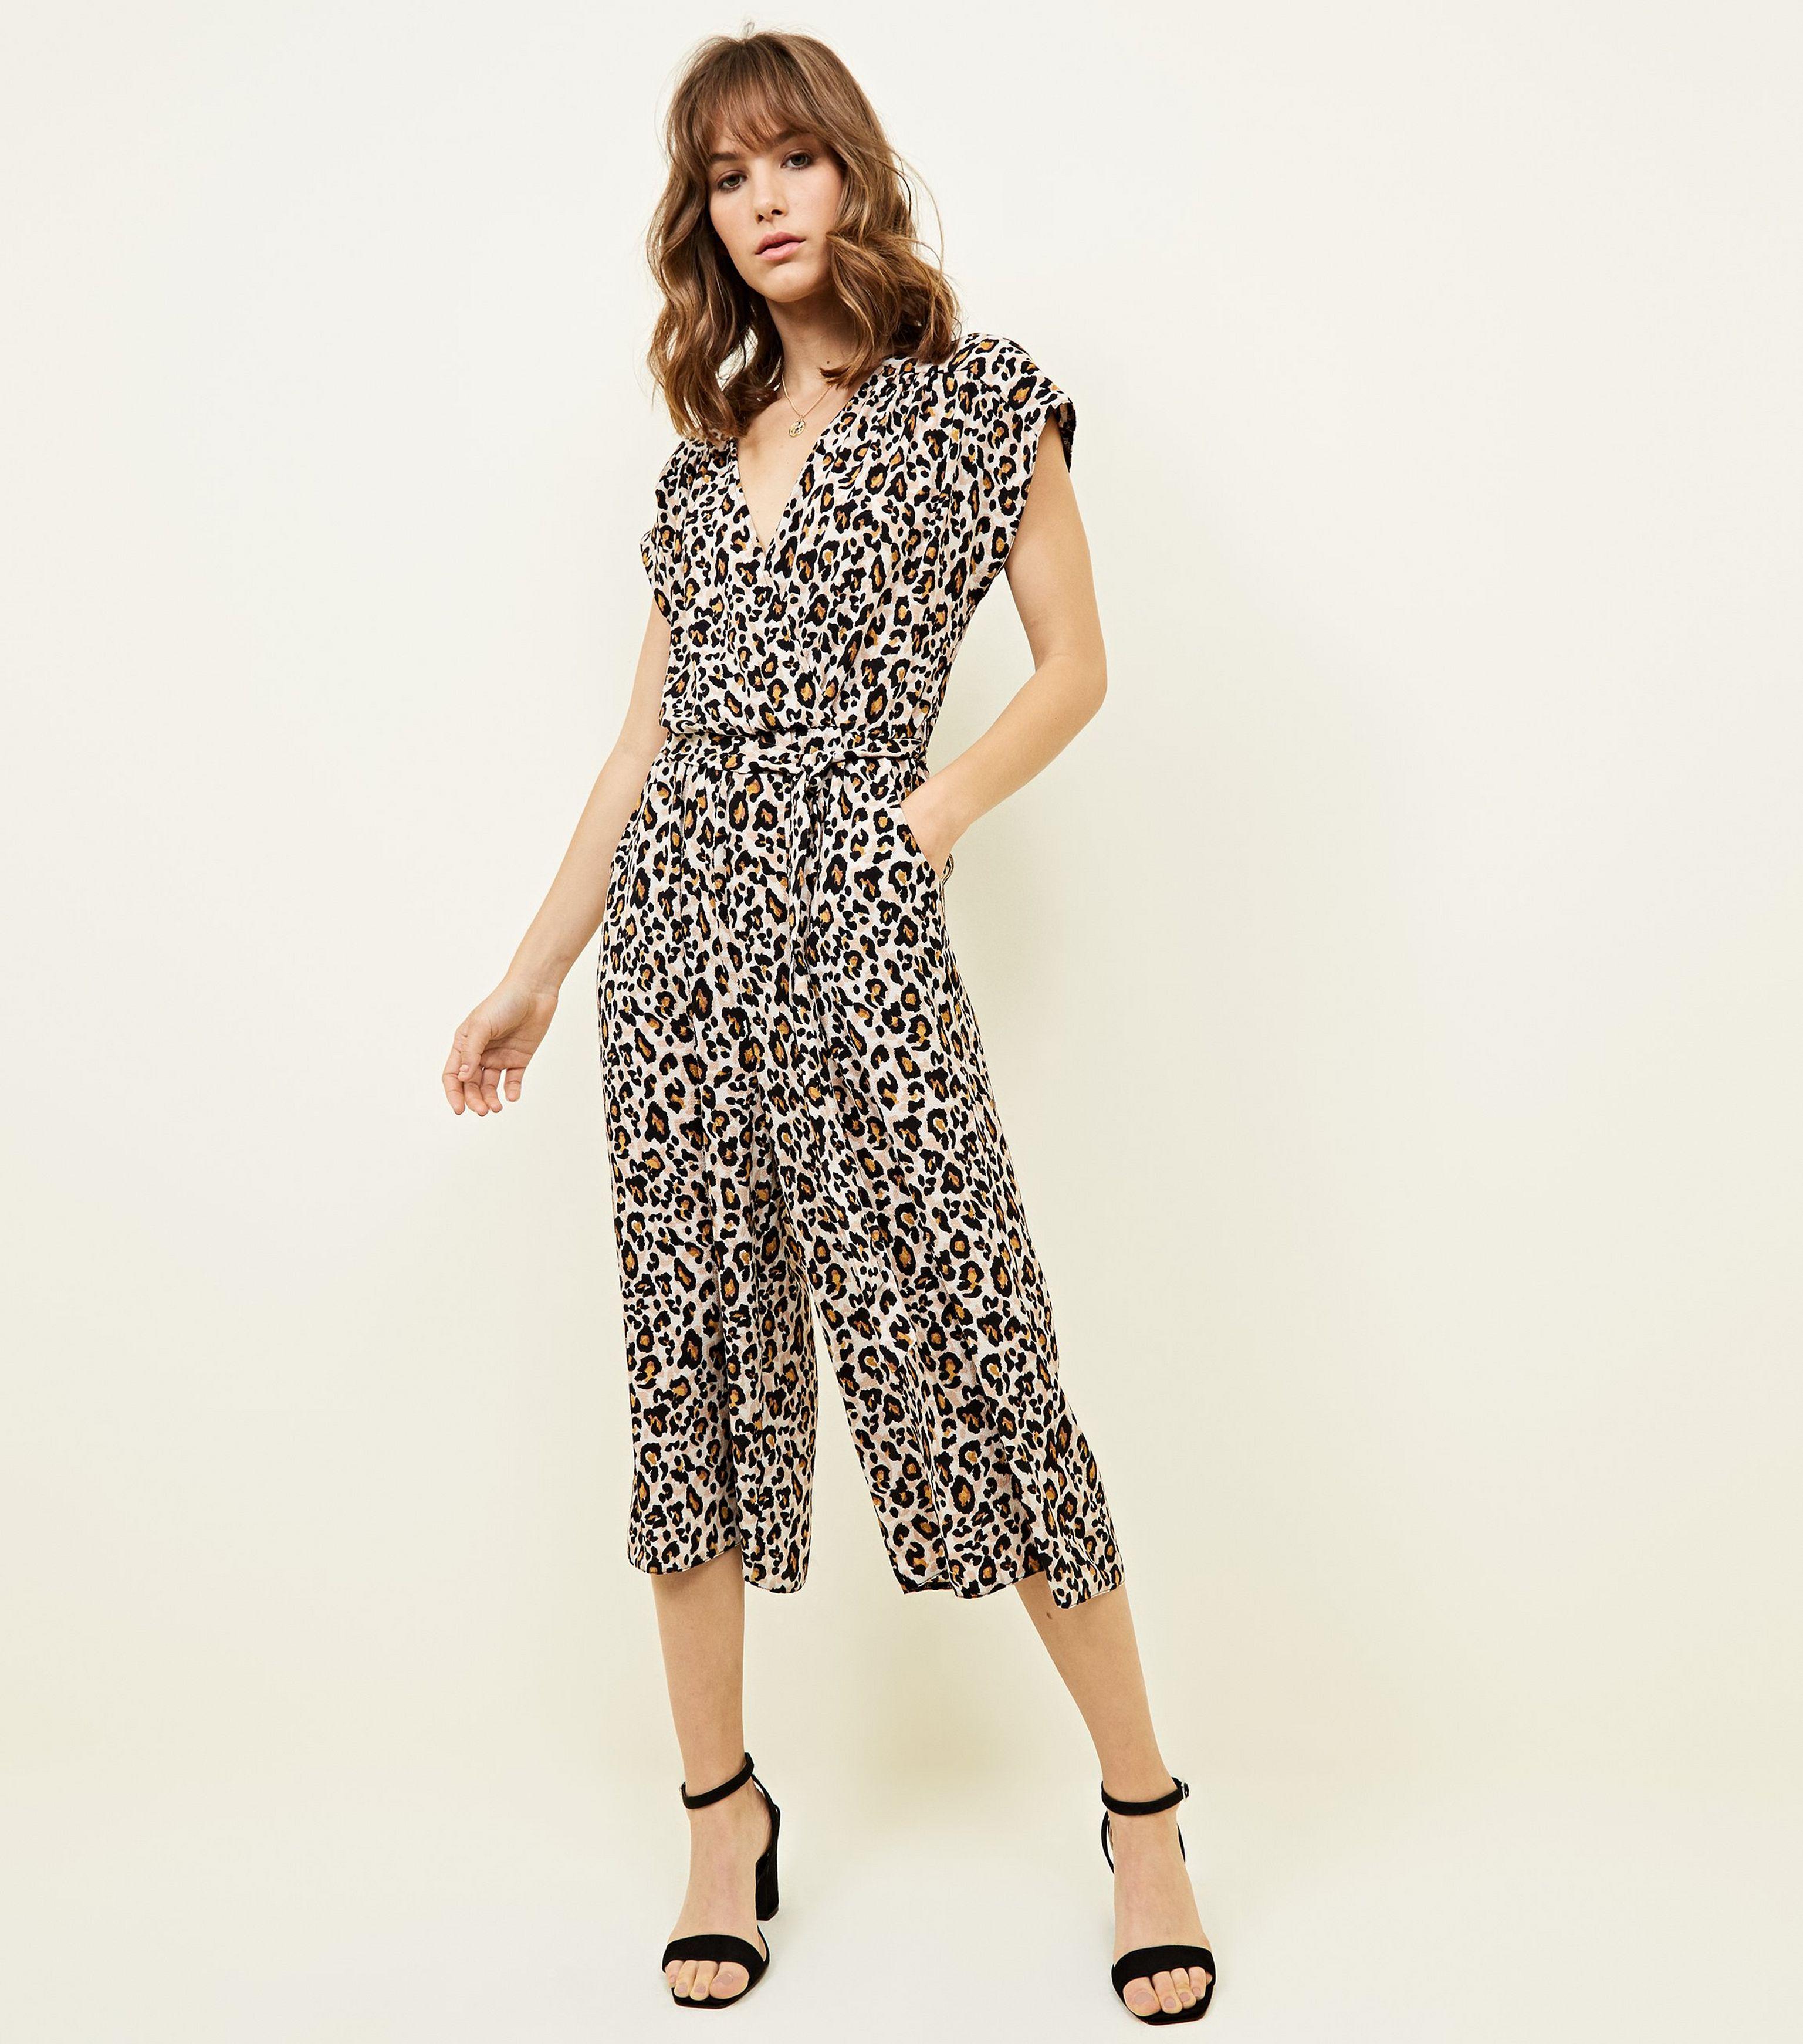 3dda2f94c3b New Look Brown Leopard Print Culotte Jumpsuit in Brown - Lyst